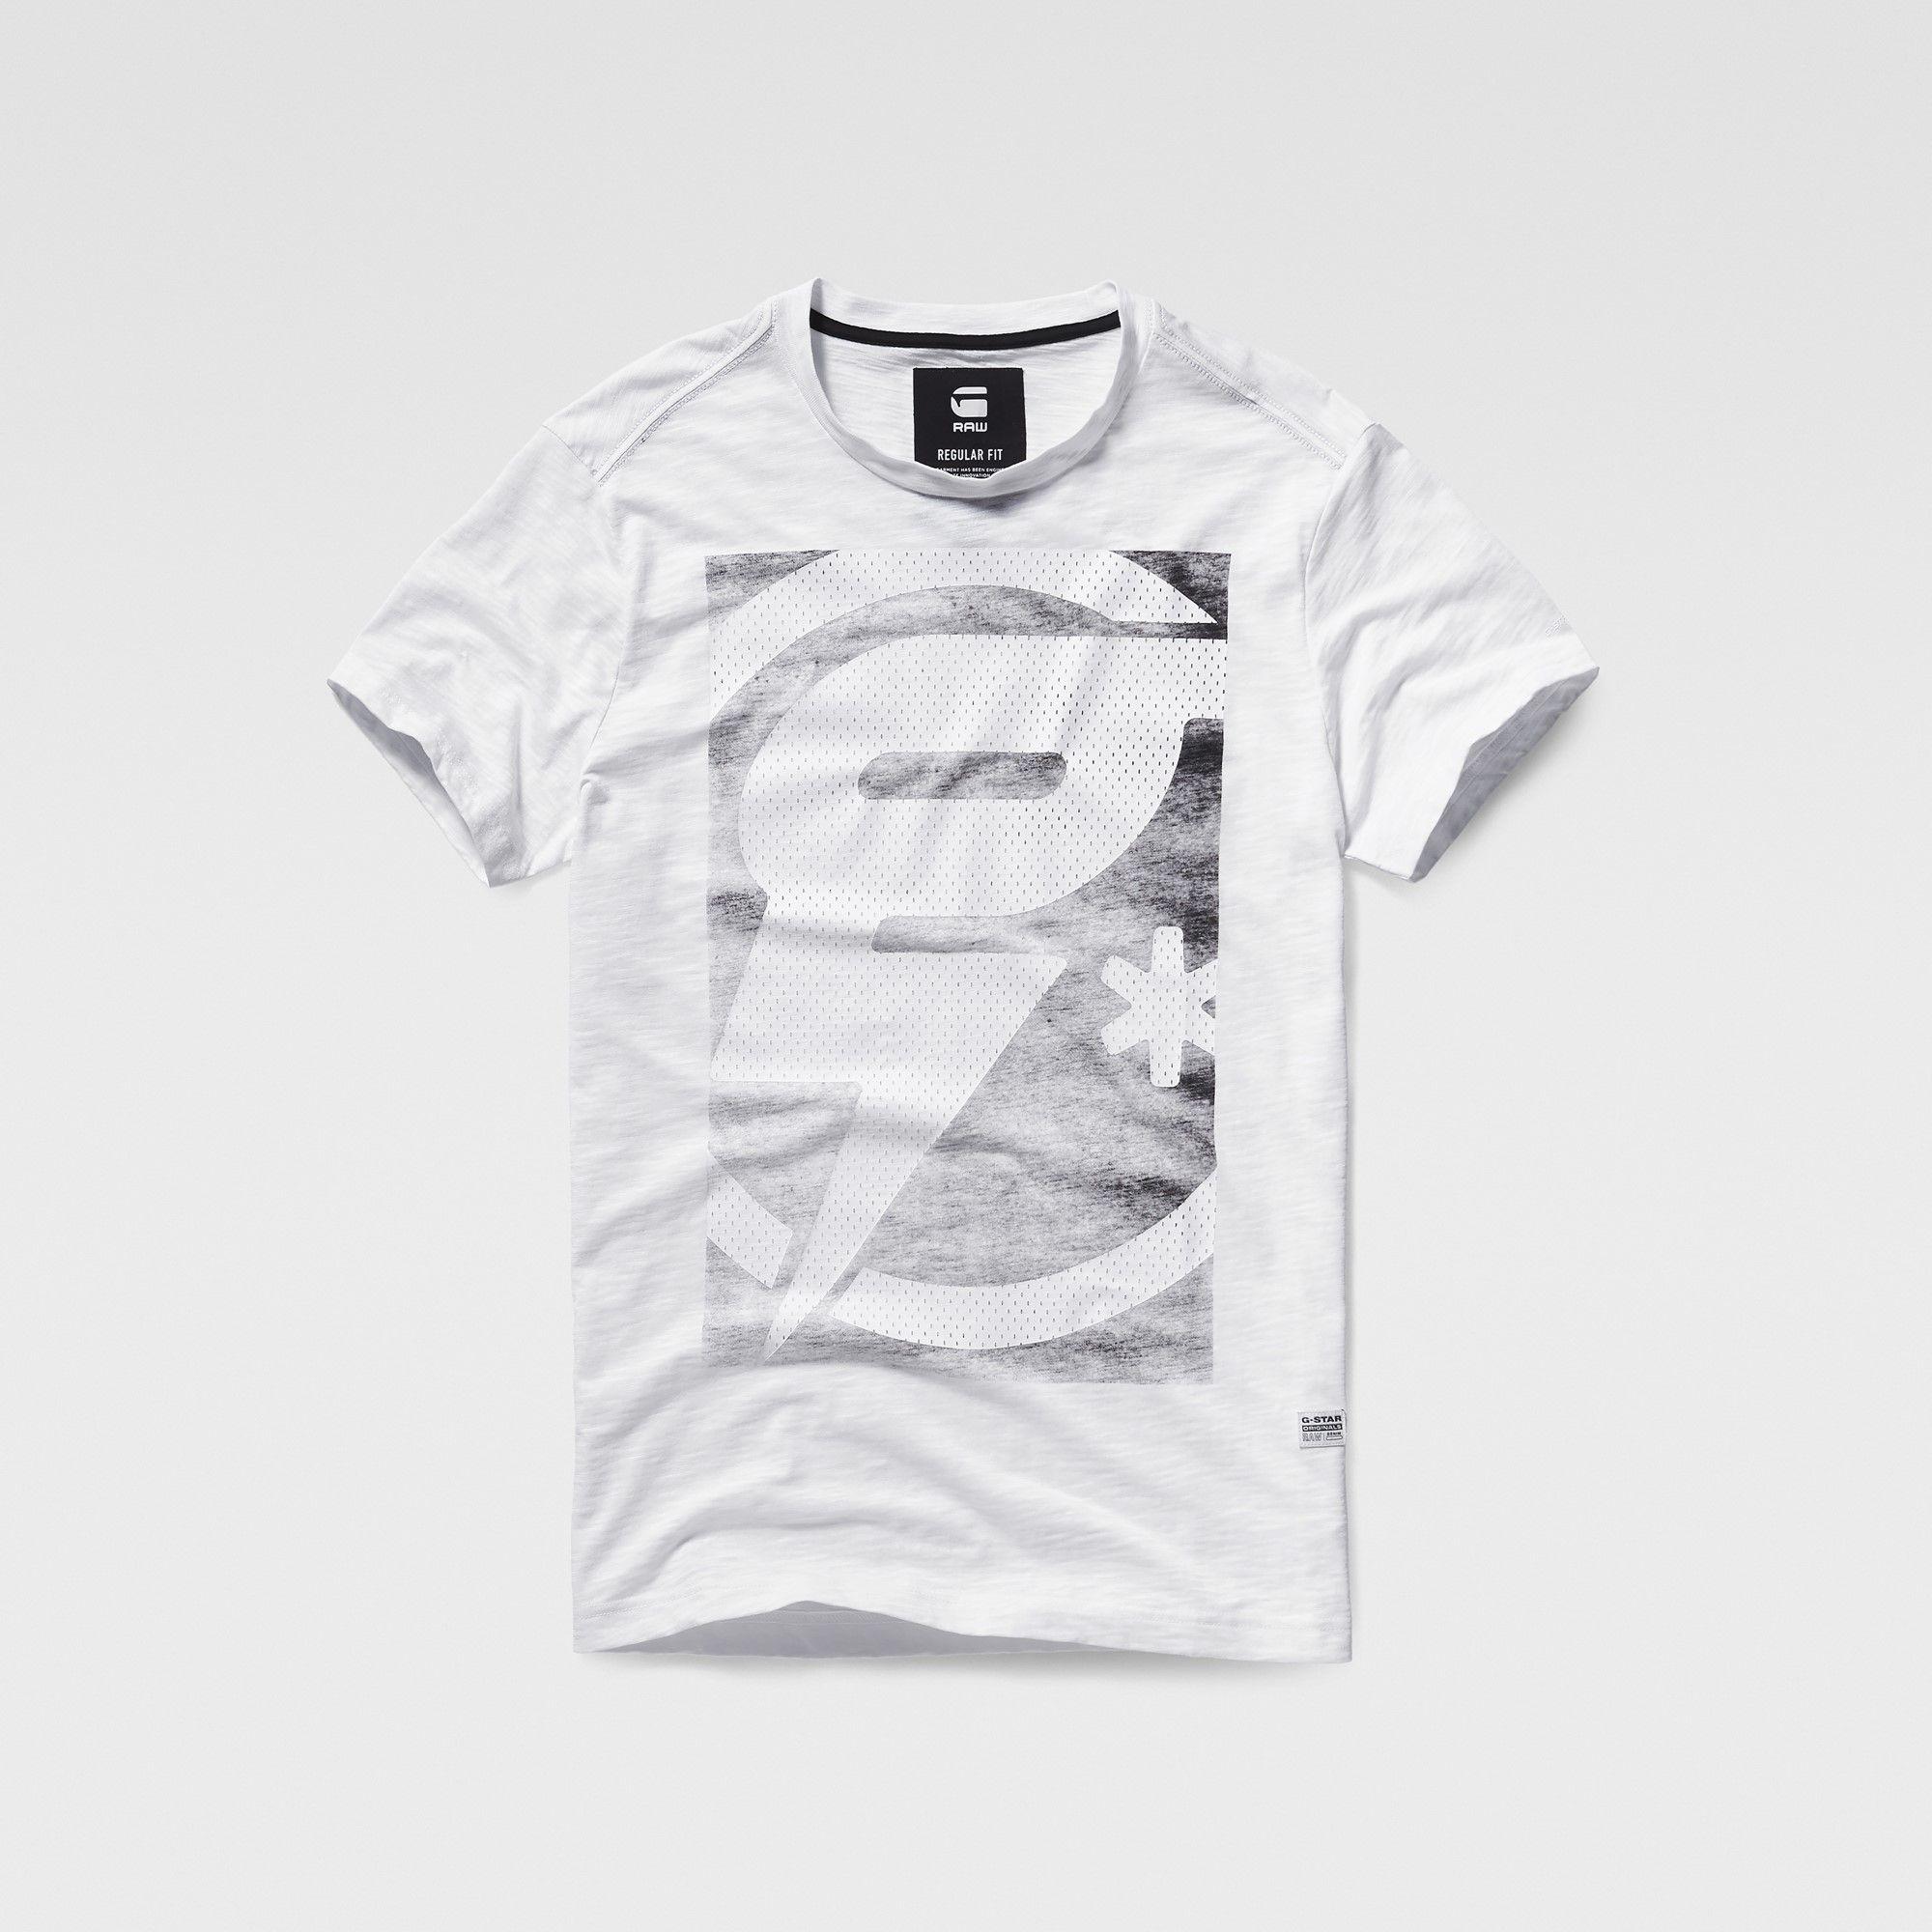 9fa6086a39 Rustril Short Sleeve T-shirt | Gstar Obsession | Pinterest | Shirts ...